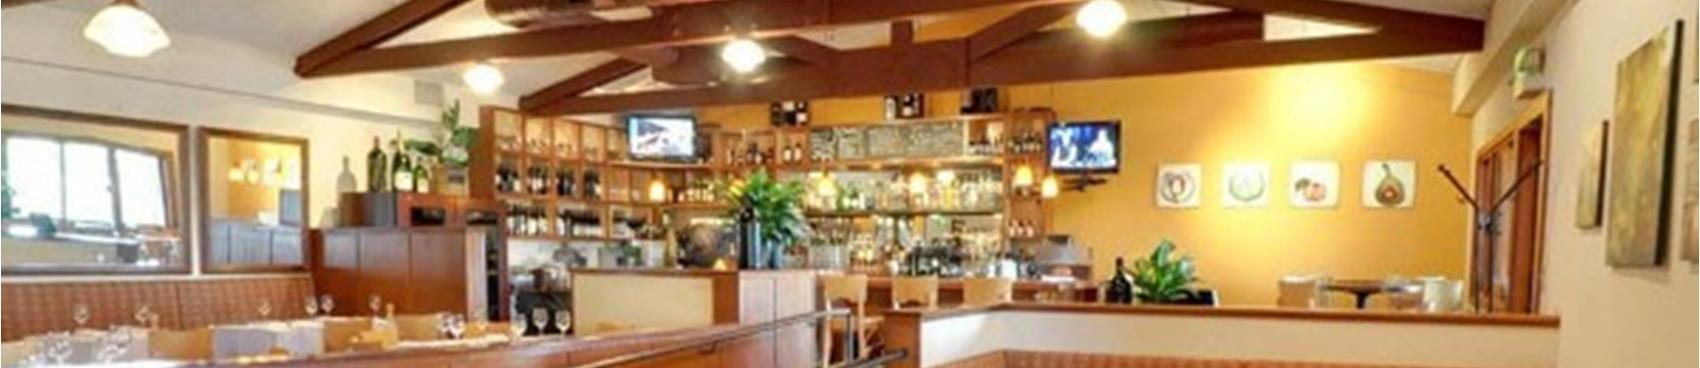 Fume Bistro & Bar